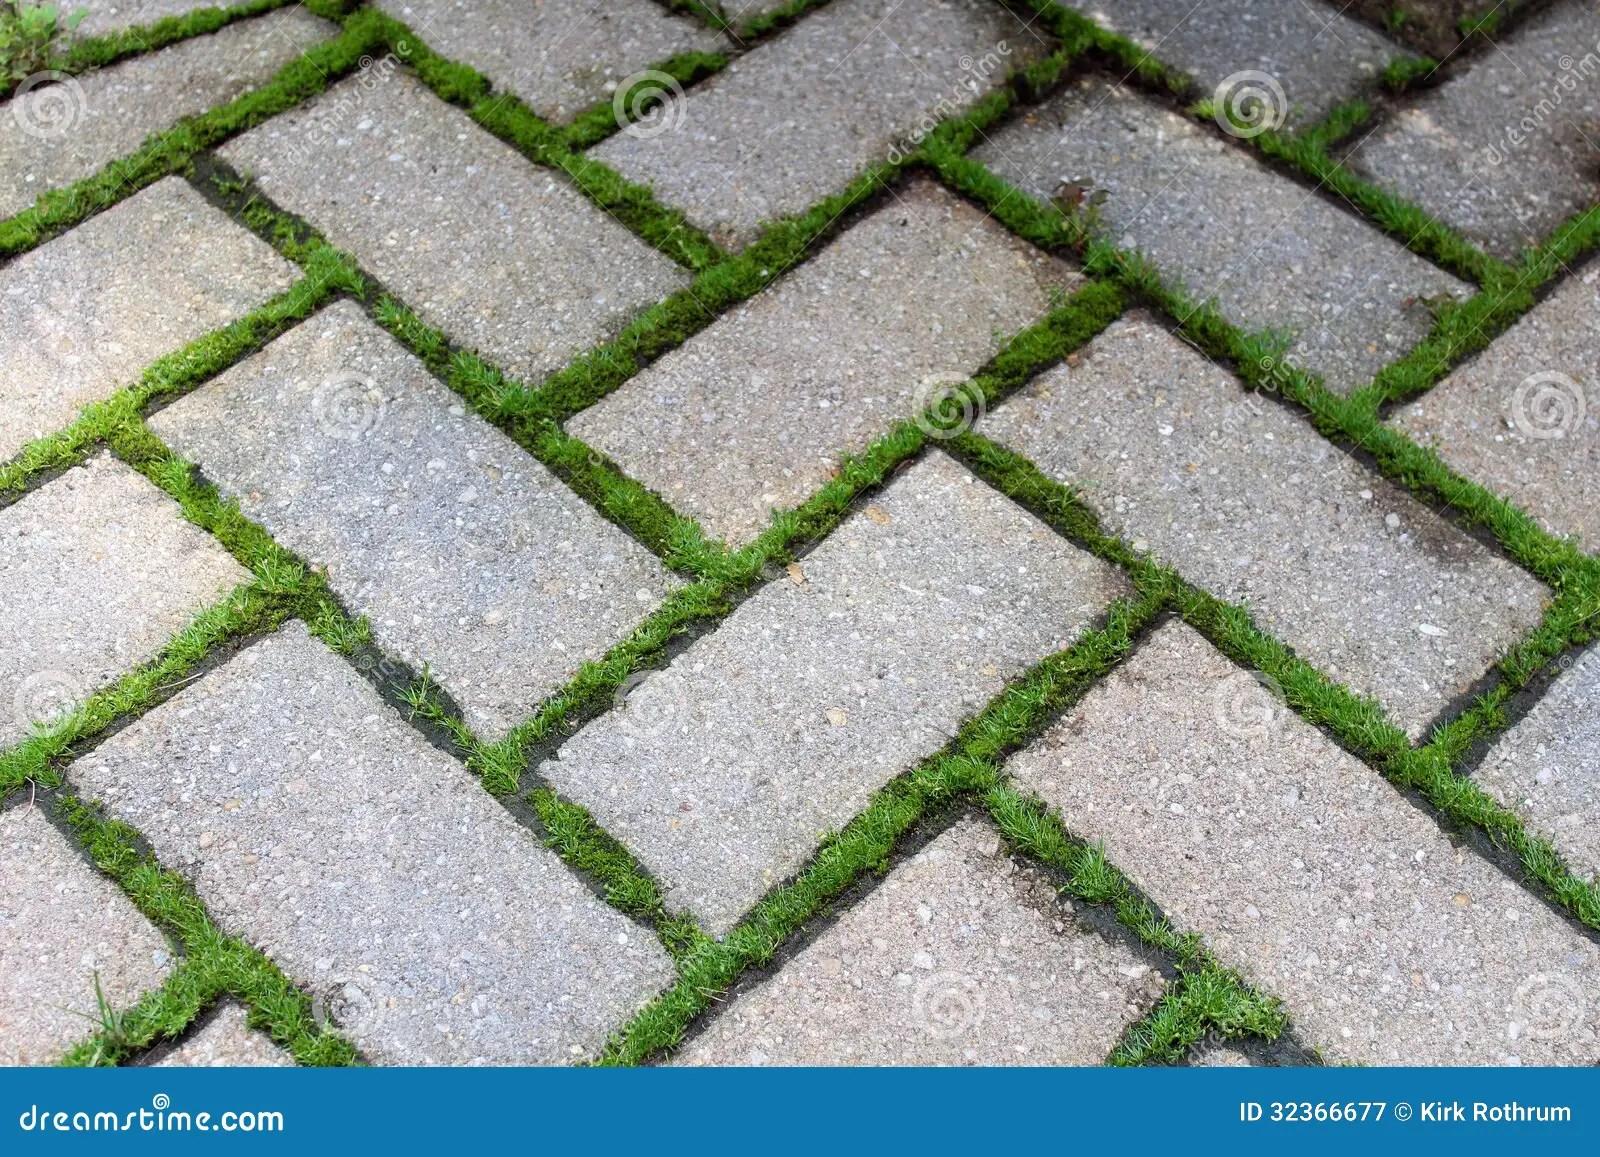 brick pavers with moss